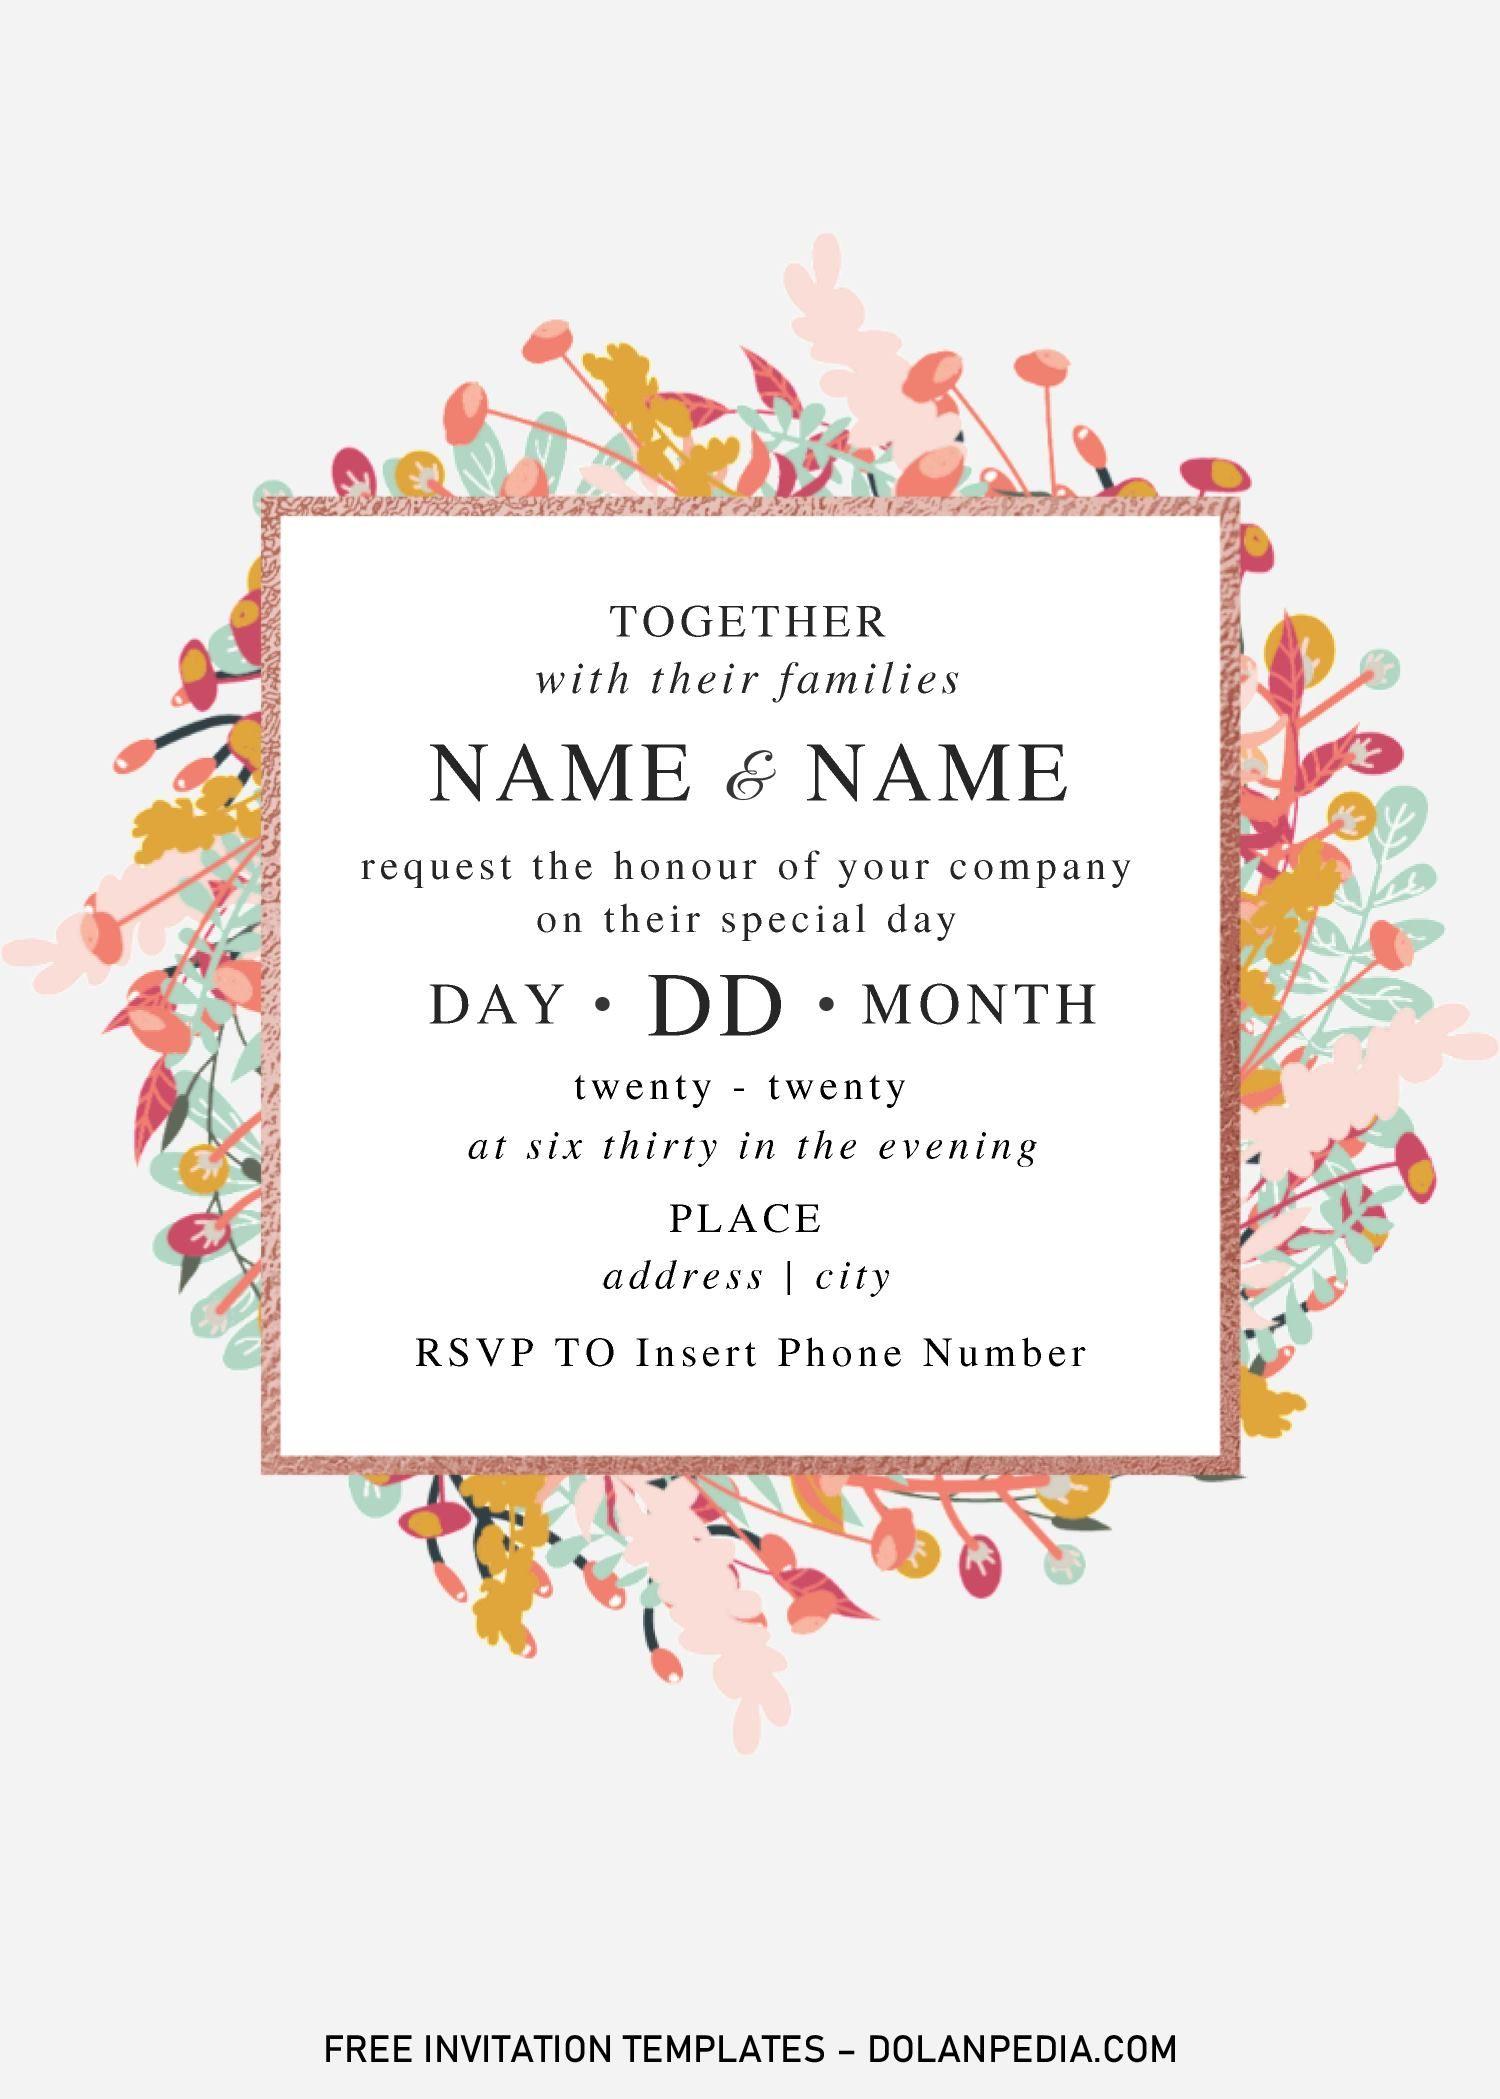 Festive Floral Wedding Invitation Templates Editable With Microsoft Word Invitation Template Wedding Invitation Templates Floral Wedding Invitations Microsoft word invitation template free